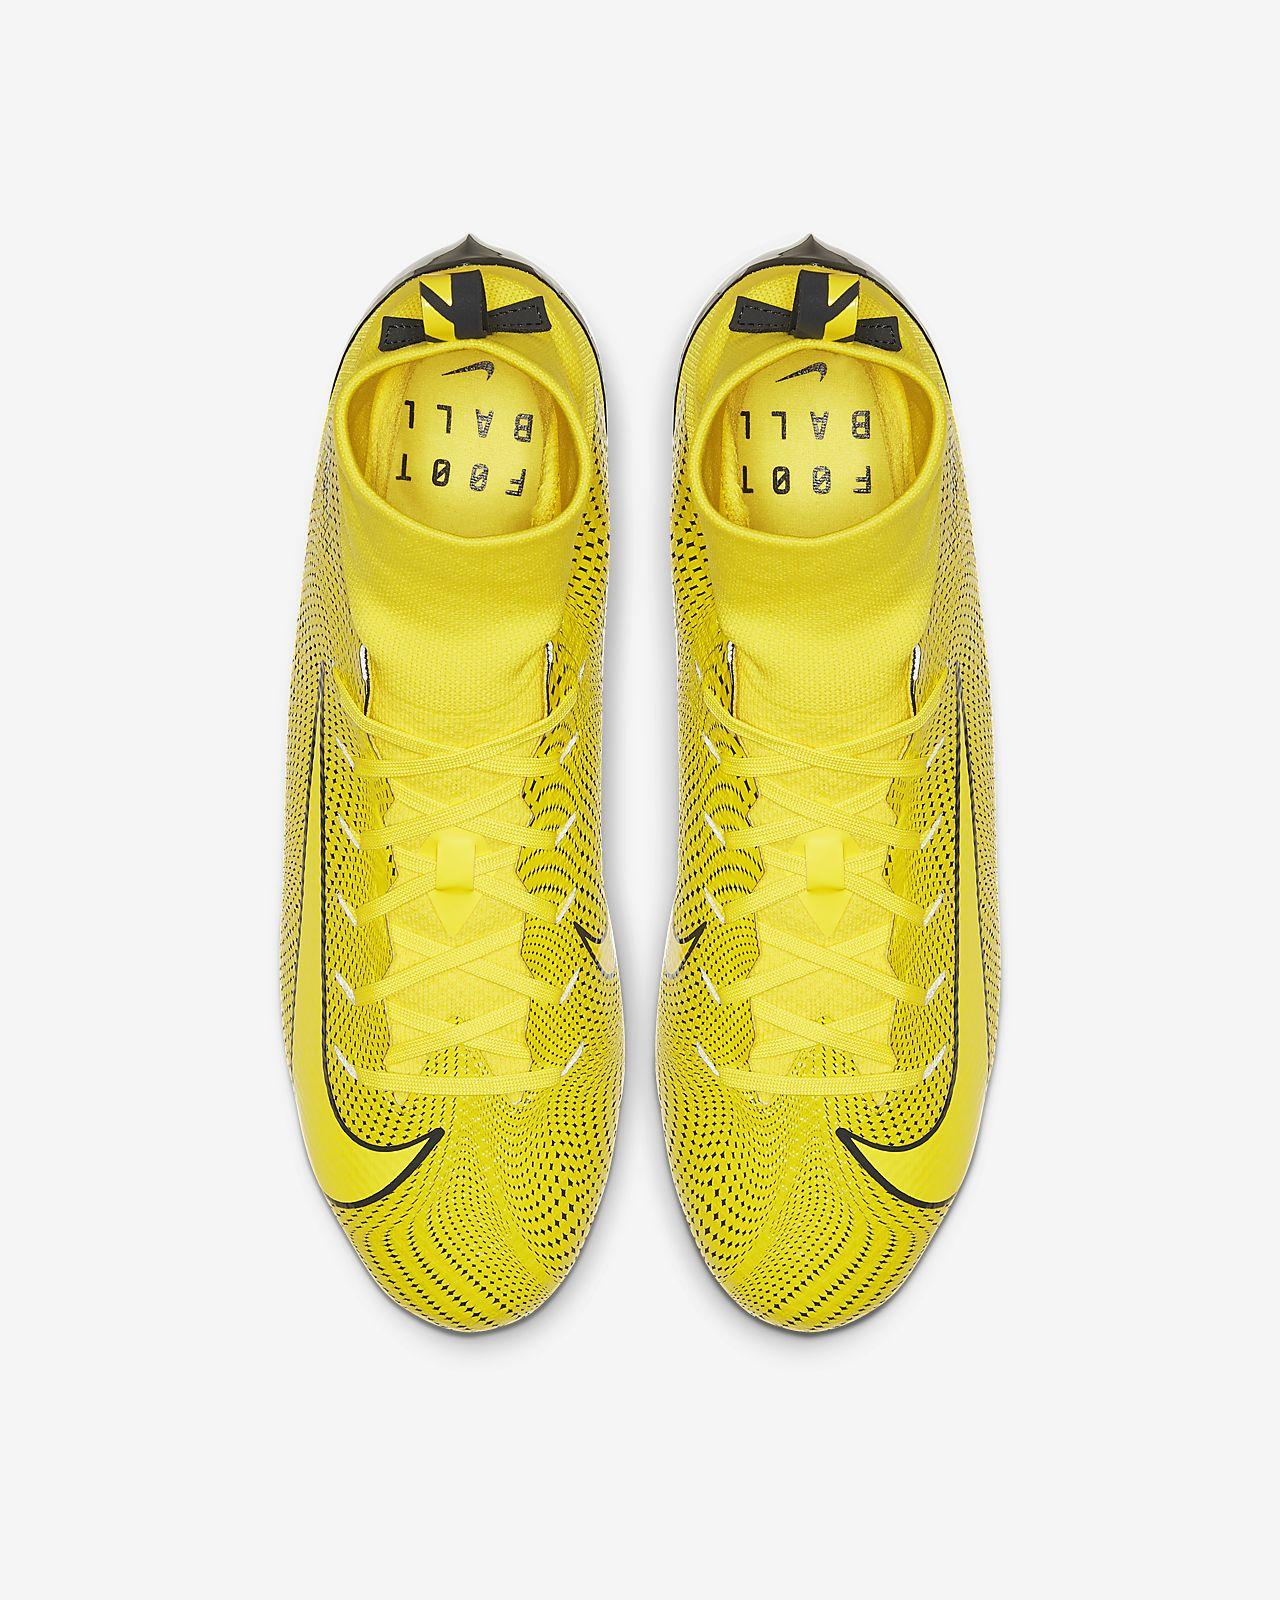 404995c32 Nike Vapor Untouchable 3 Pro Football Cleat. Nike.com